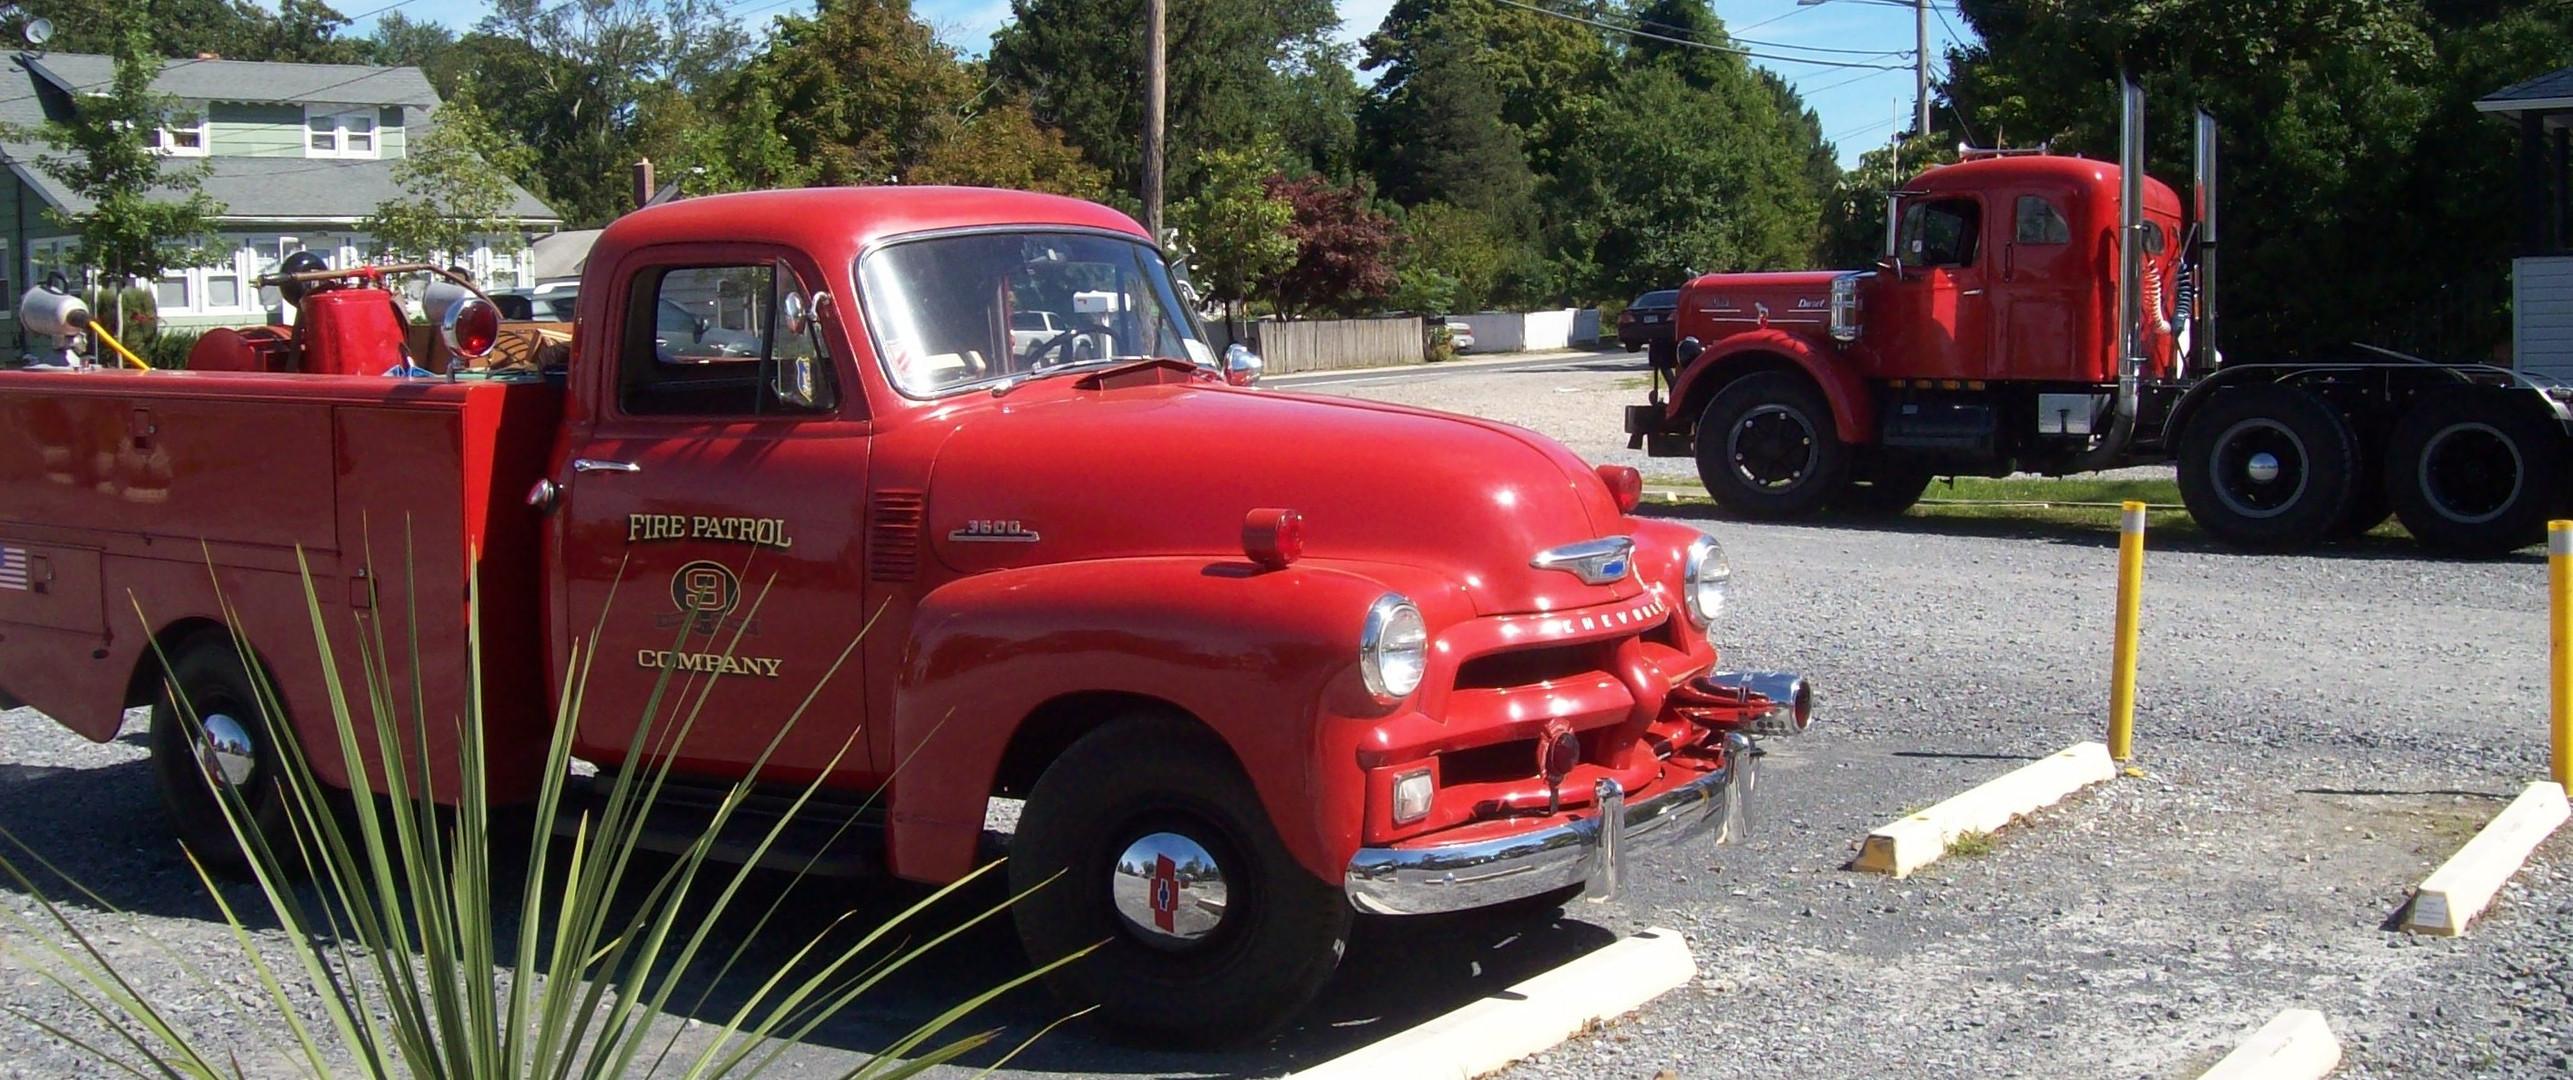 Philip Kenter's 1954 Chevrolet 3600 Fire Patrol truck